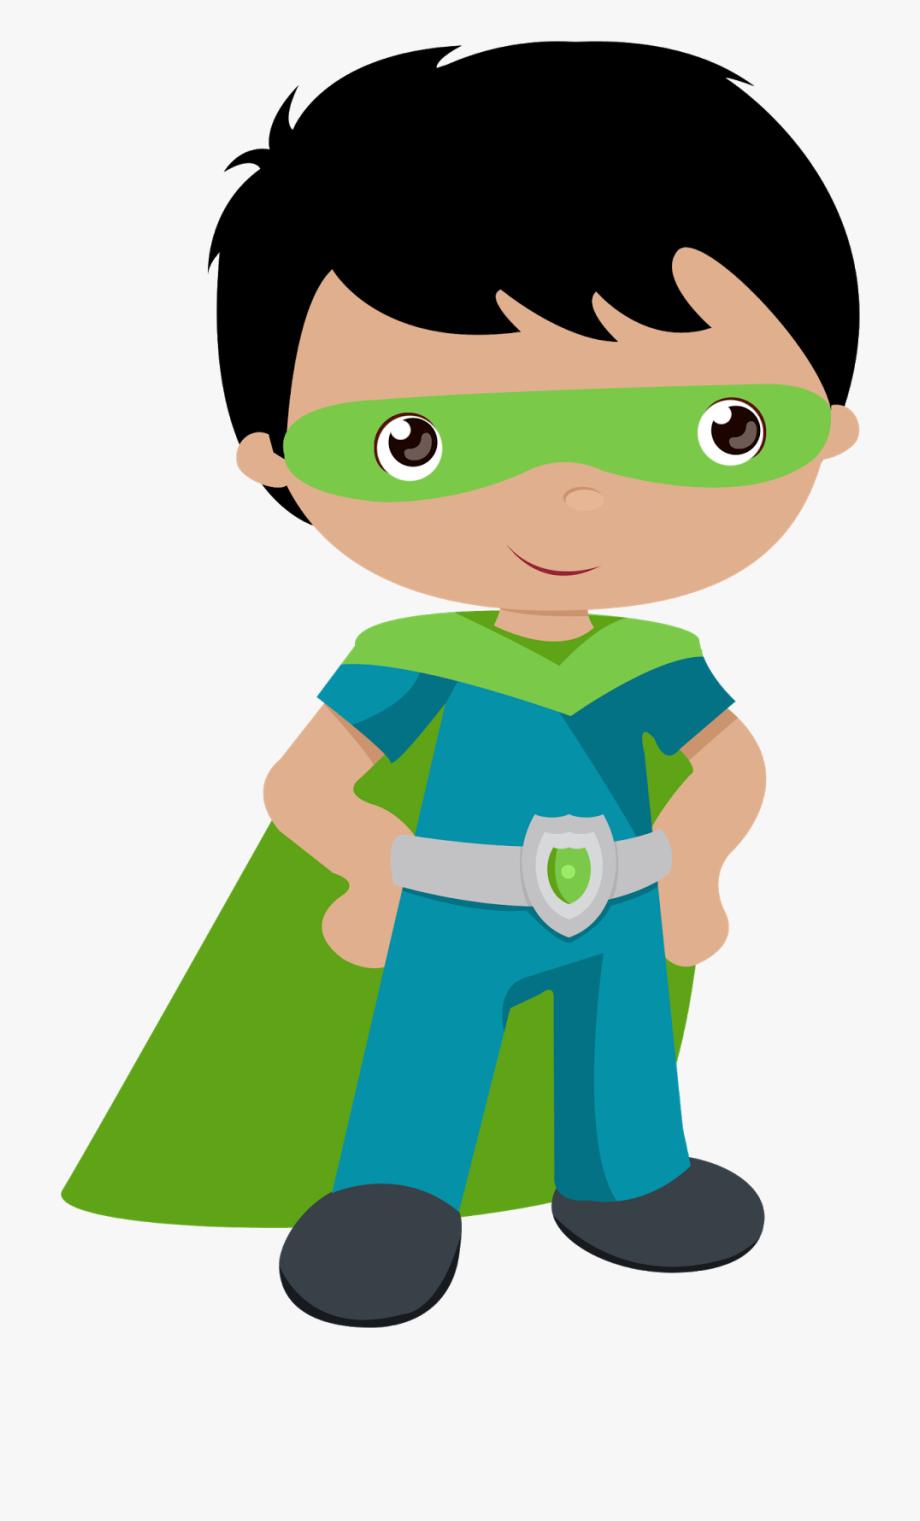 Free cliparts on clipartwiki. Clipart boy superhero